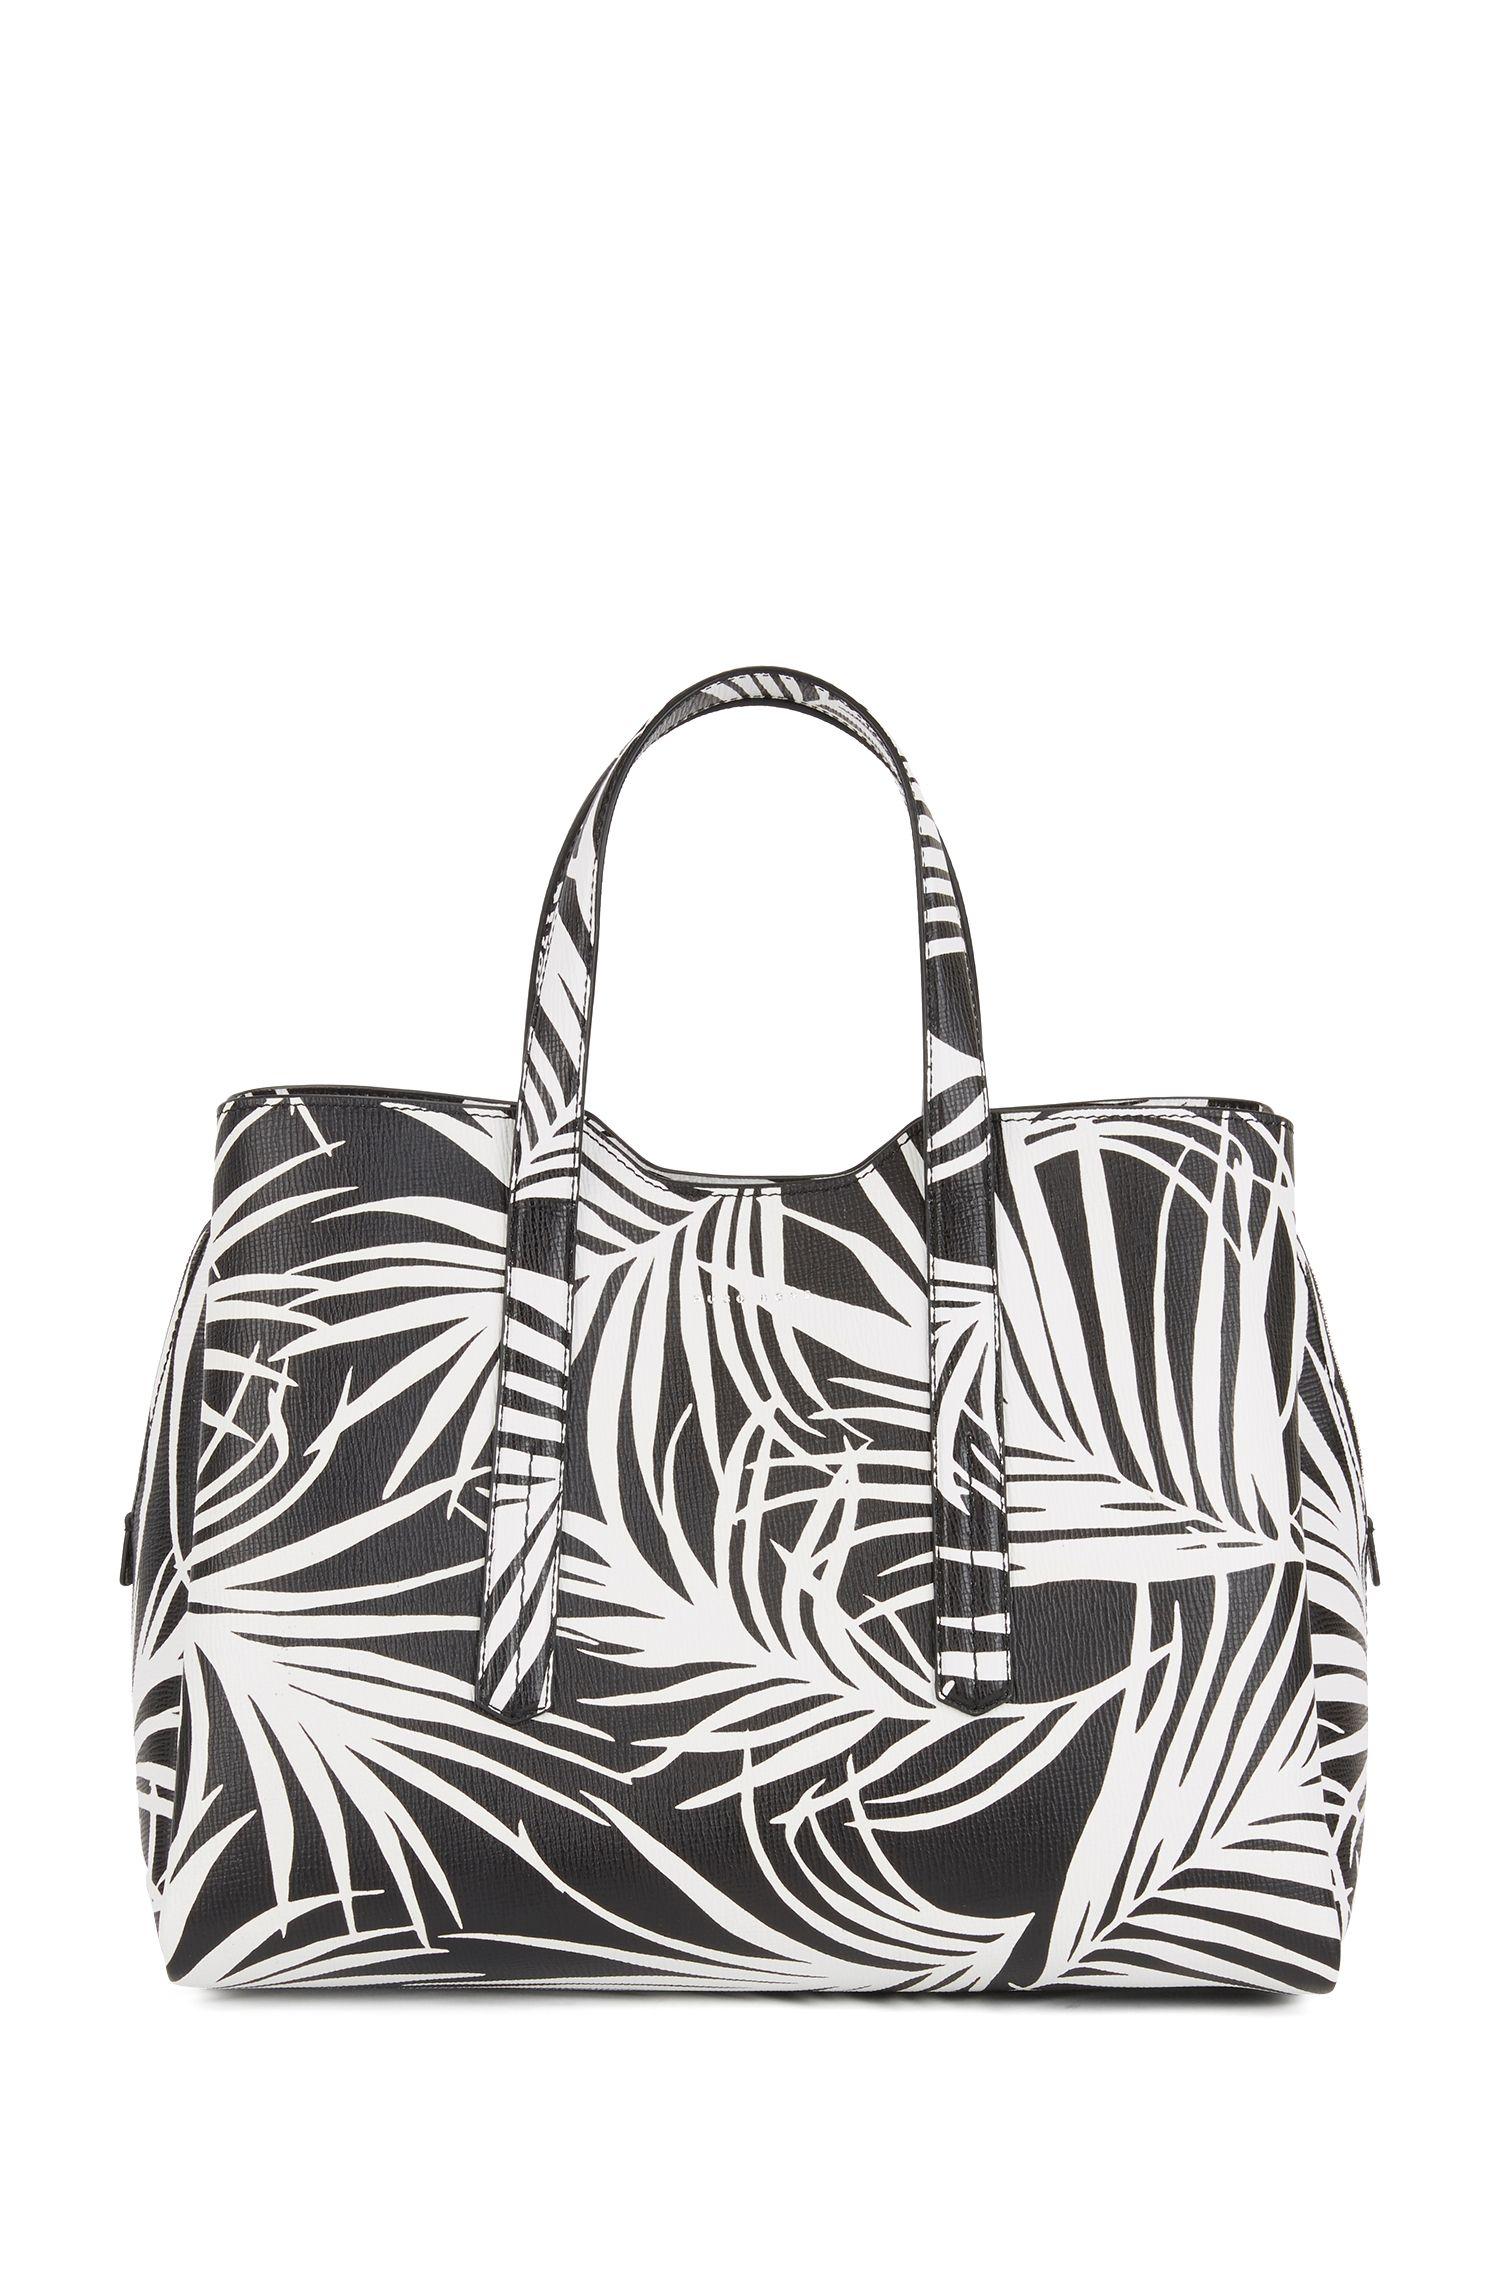 Tote bag in Italian calf leather with seasonal print, Black